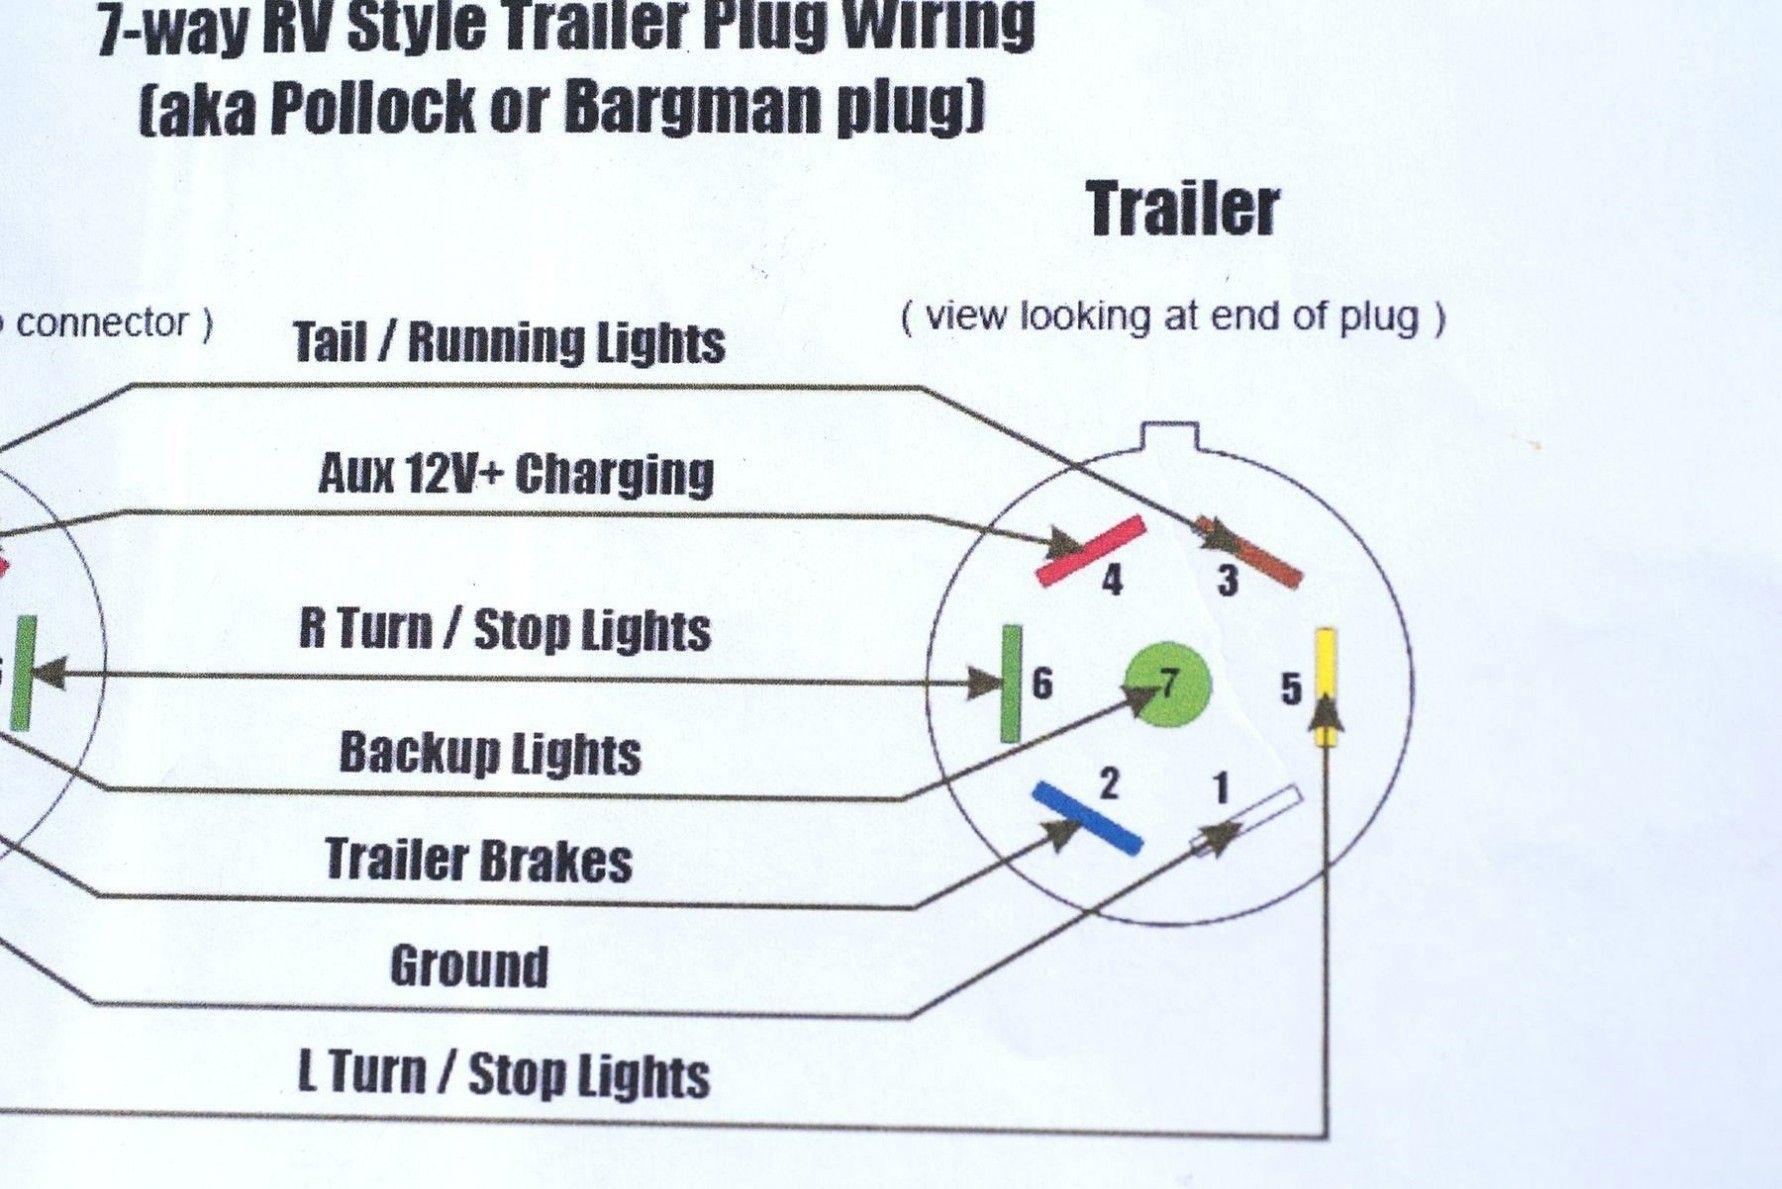 bargman rv plug wiring beautiful wiring diagram for seven wire trailer plug diagrams  wiring diagram for seven wire trailer